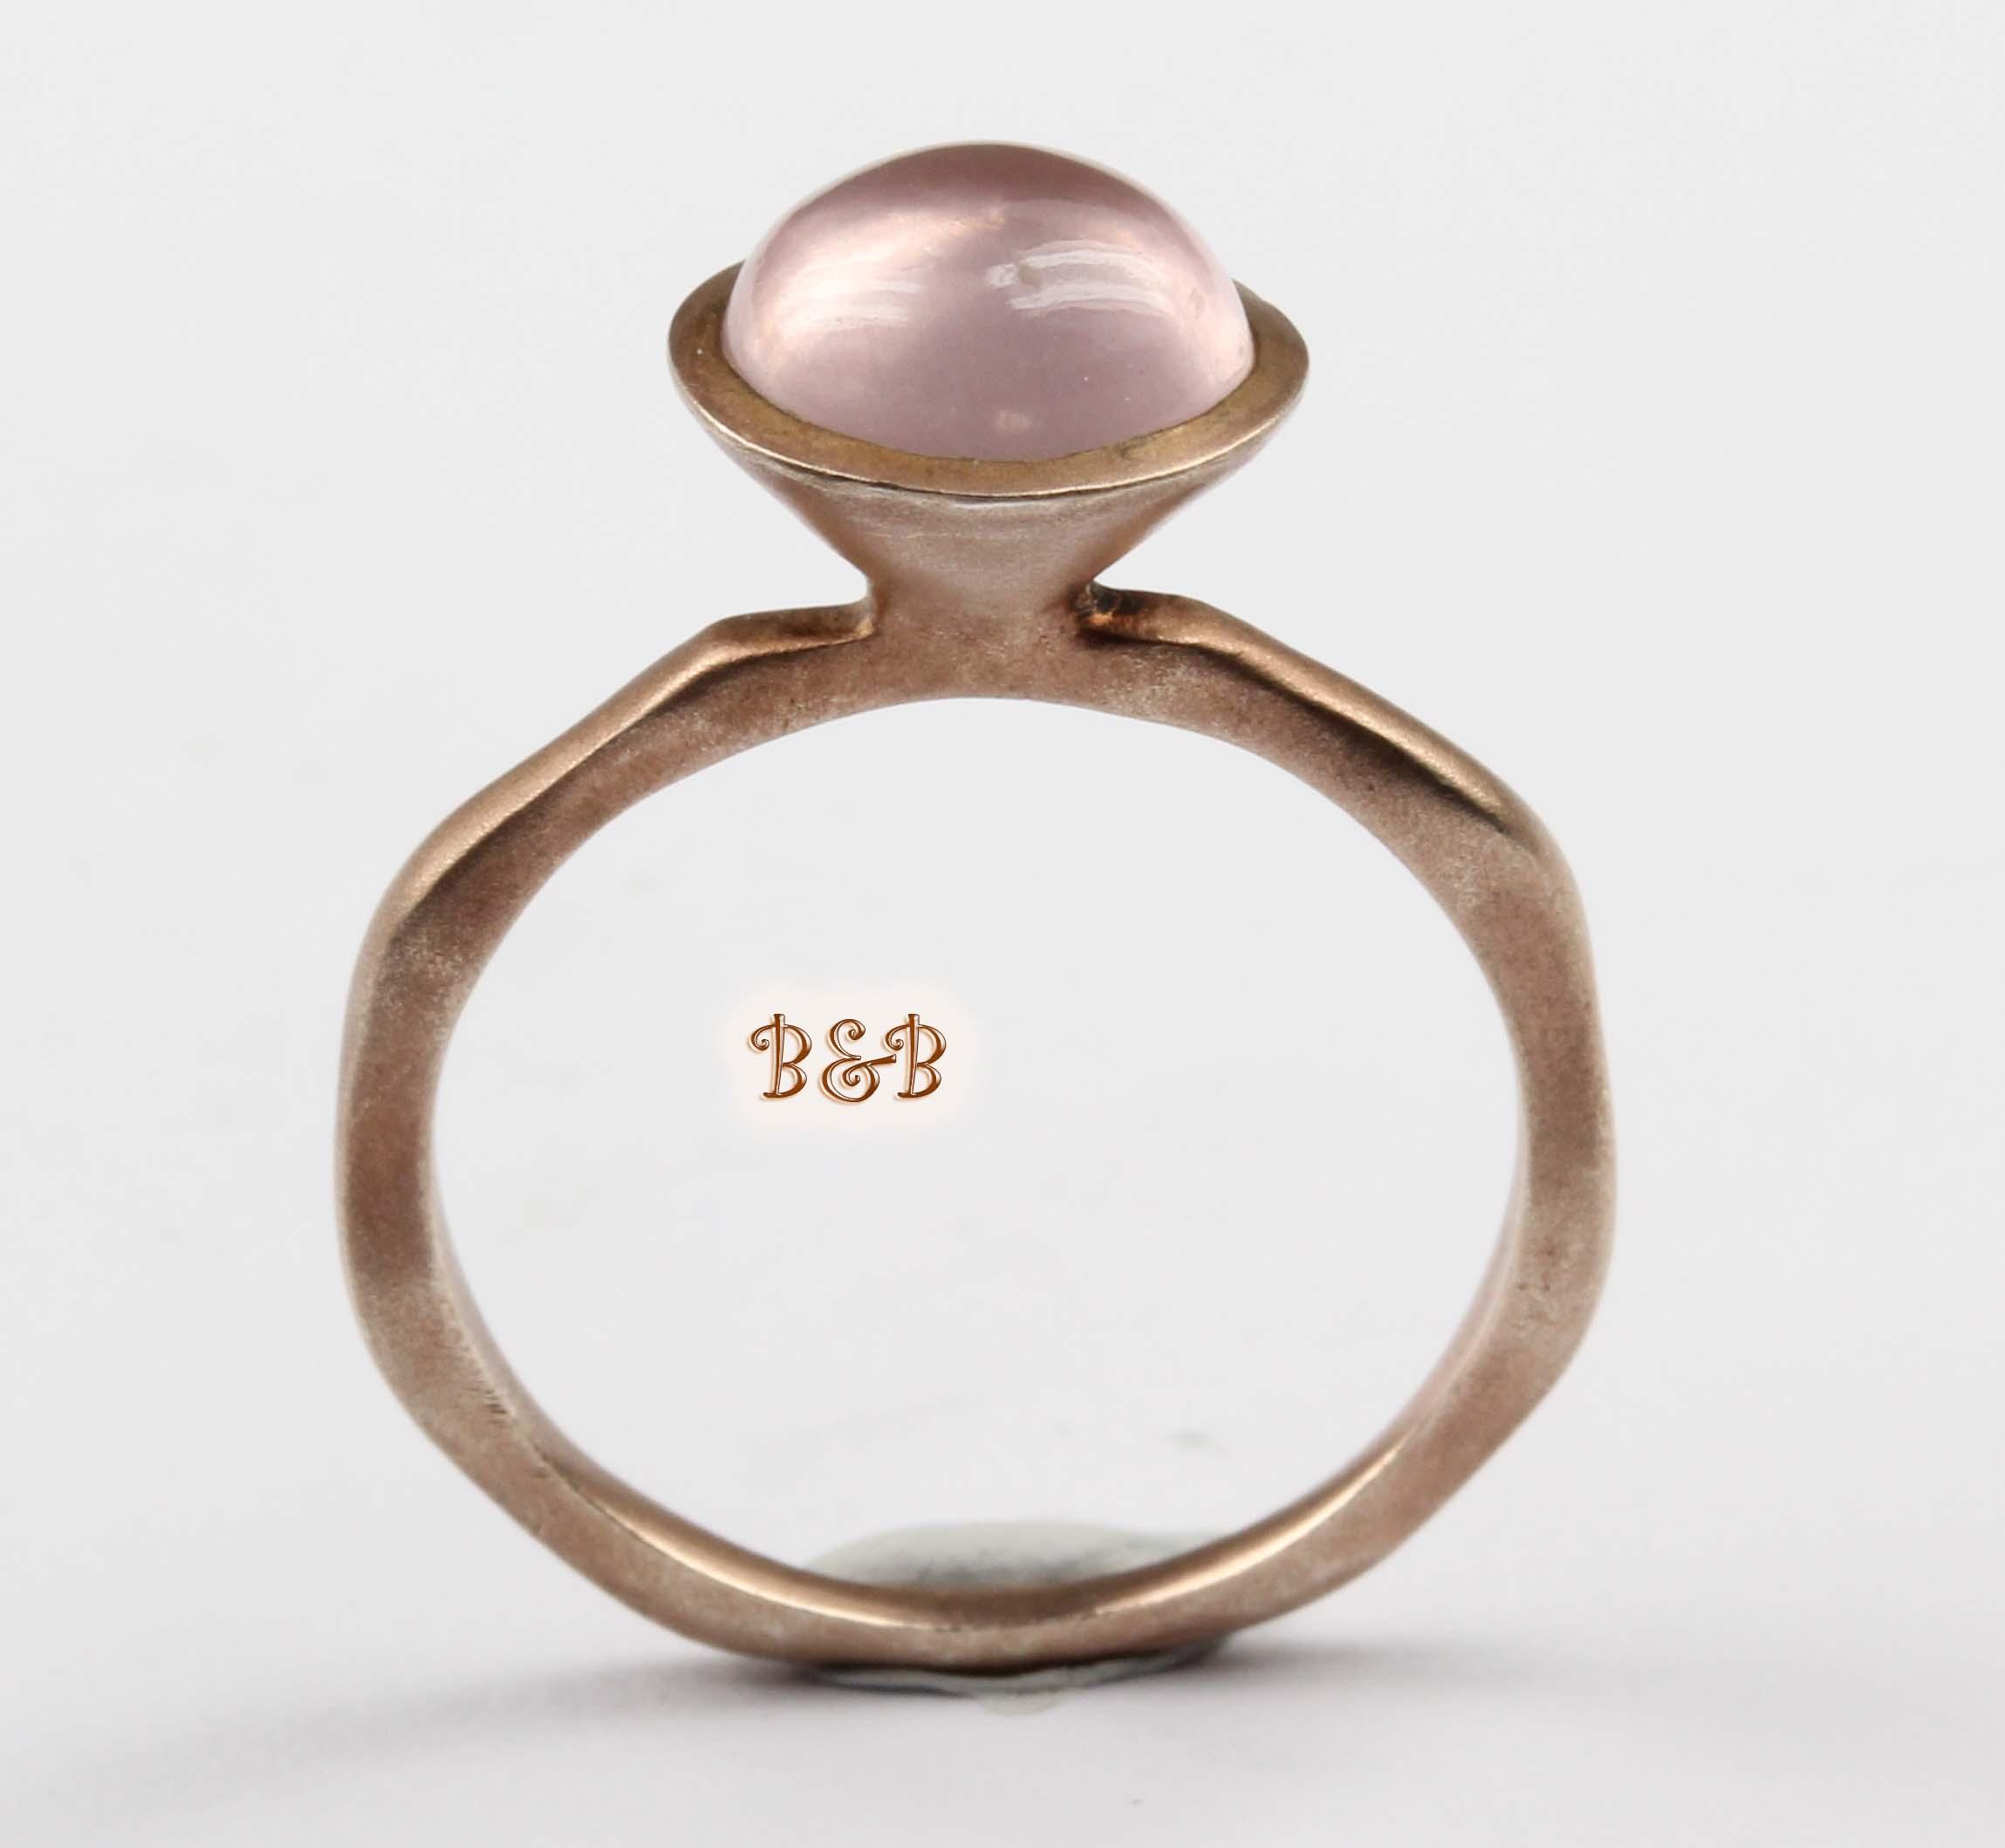 Silver ring_B&B_1587